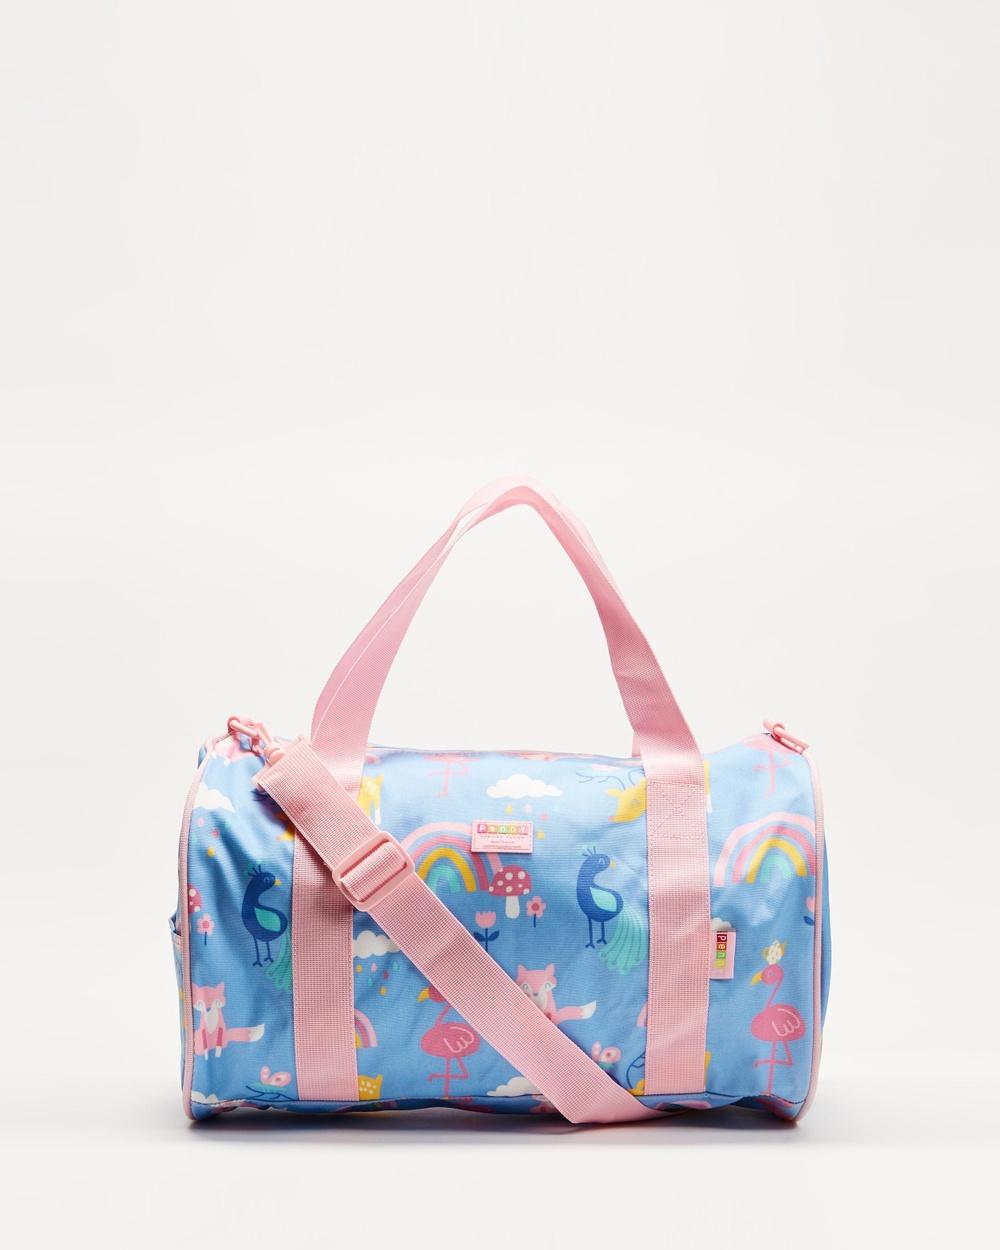 Penny Scallan Coated Rainbow Duffle Bag Kids Bags Rainbow